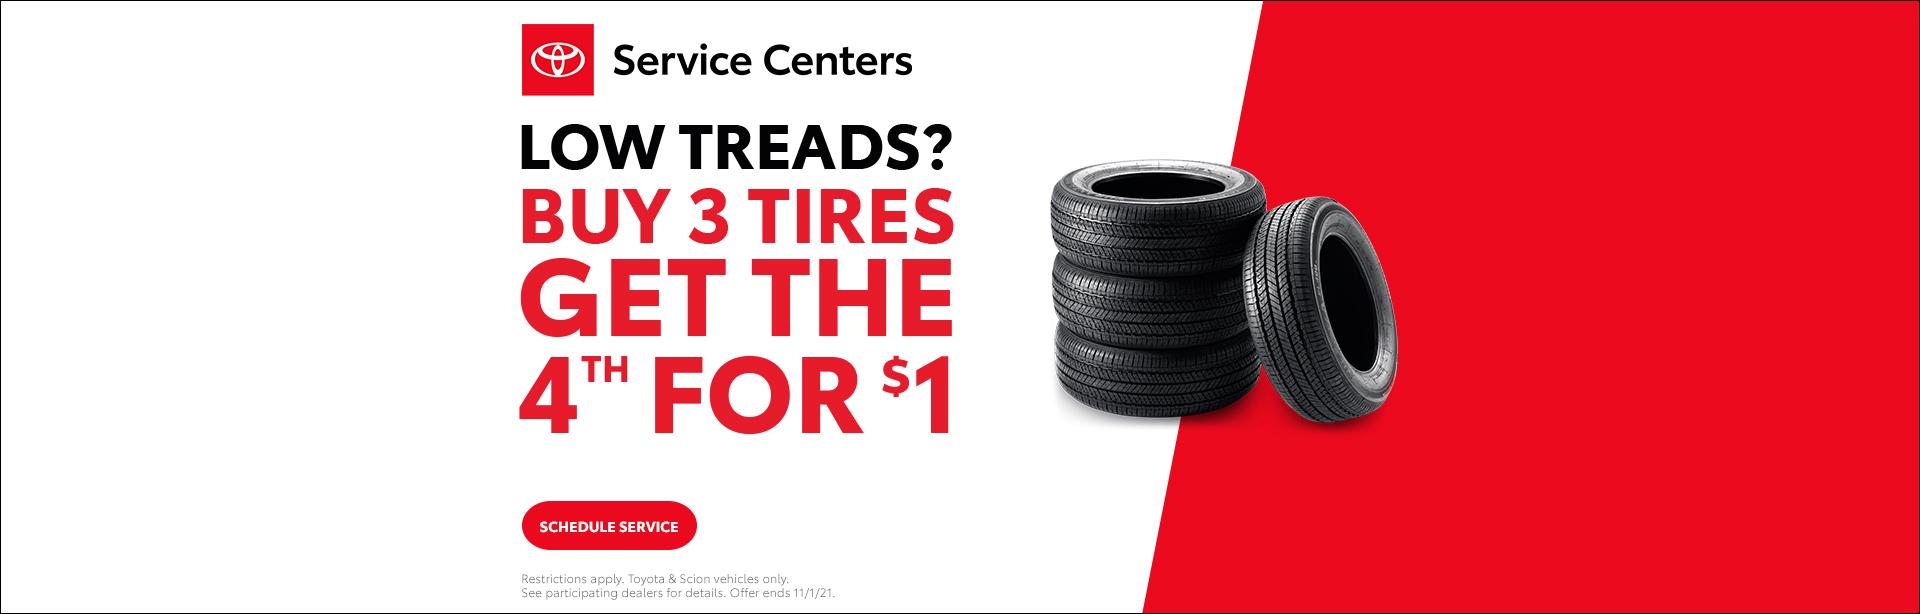 10-21_01_All-TDAs-September-2021-NAT-Buy-3-Tires_1920x614_4e89_All-Models_R_xta.jpeg